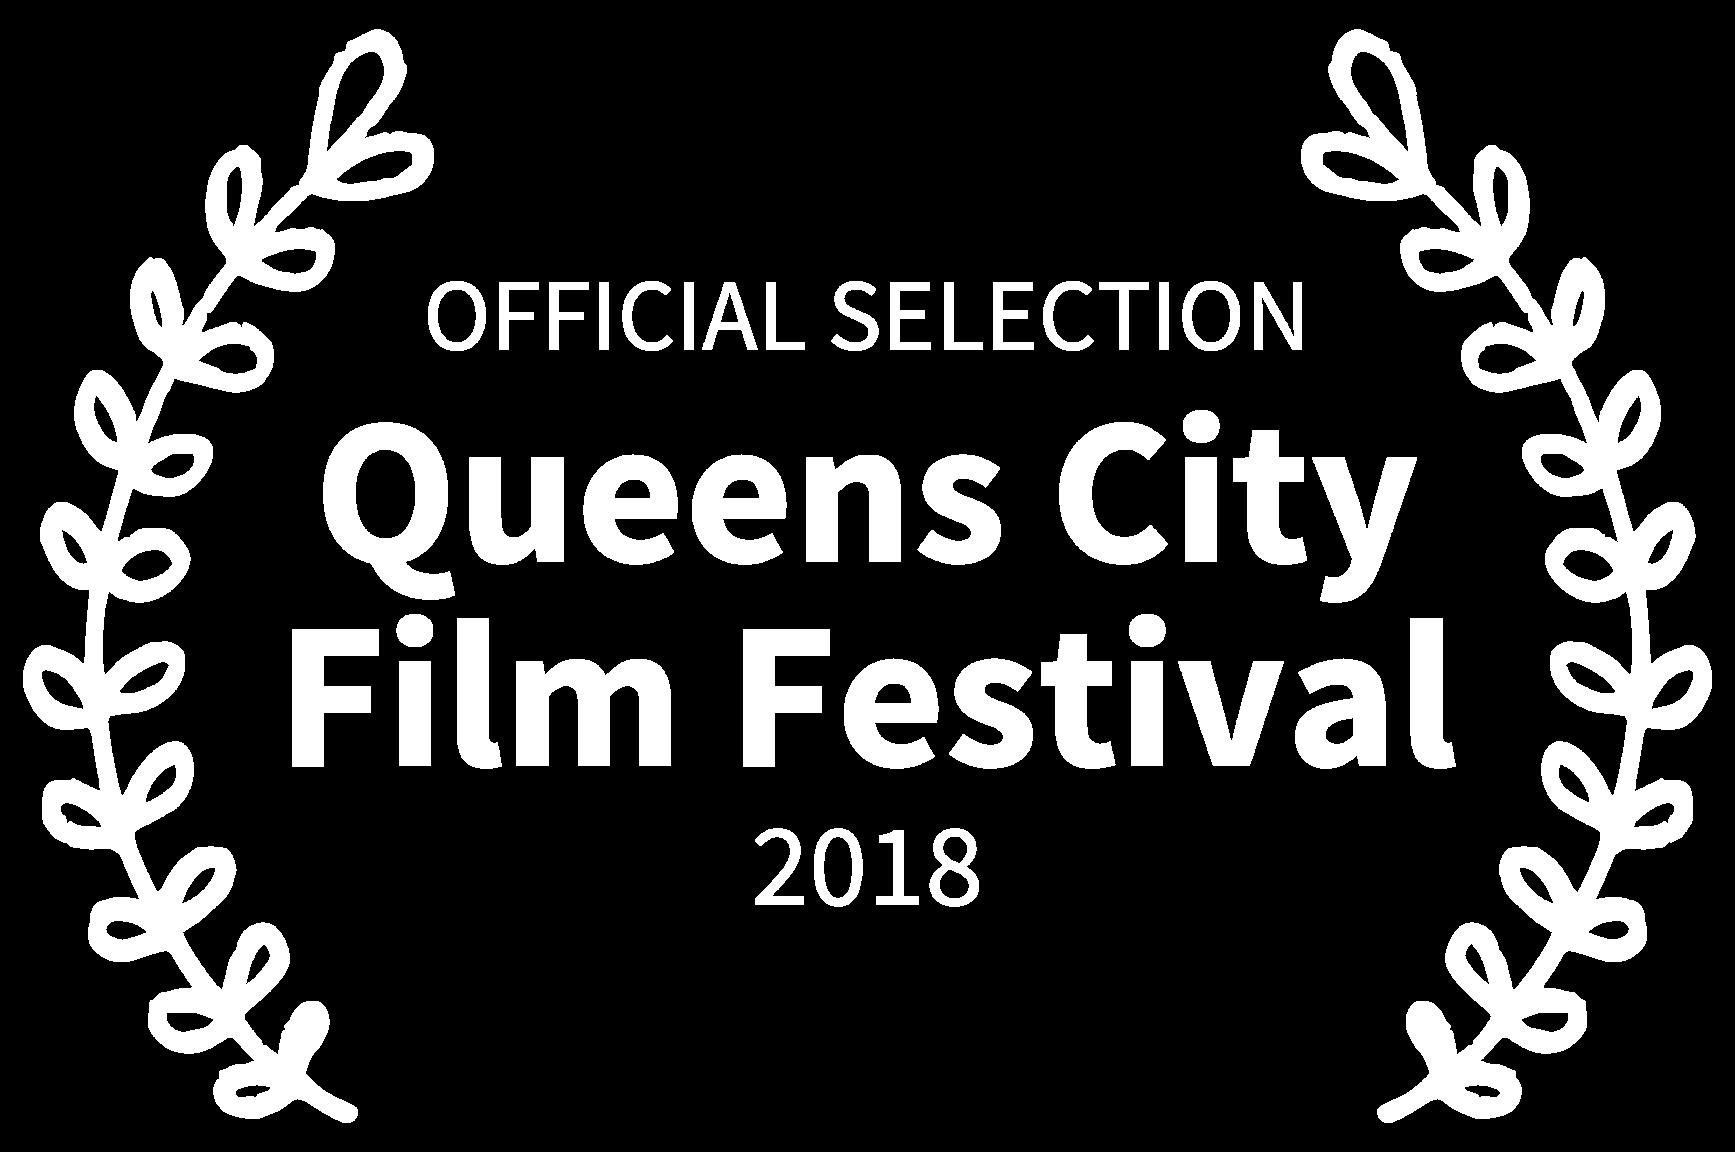 Queens City Film Festival - 2018.png